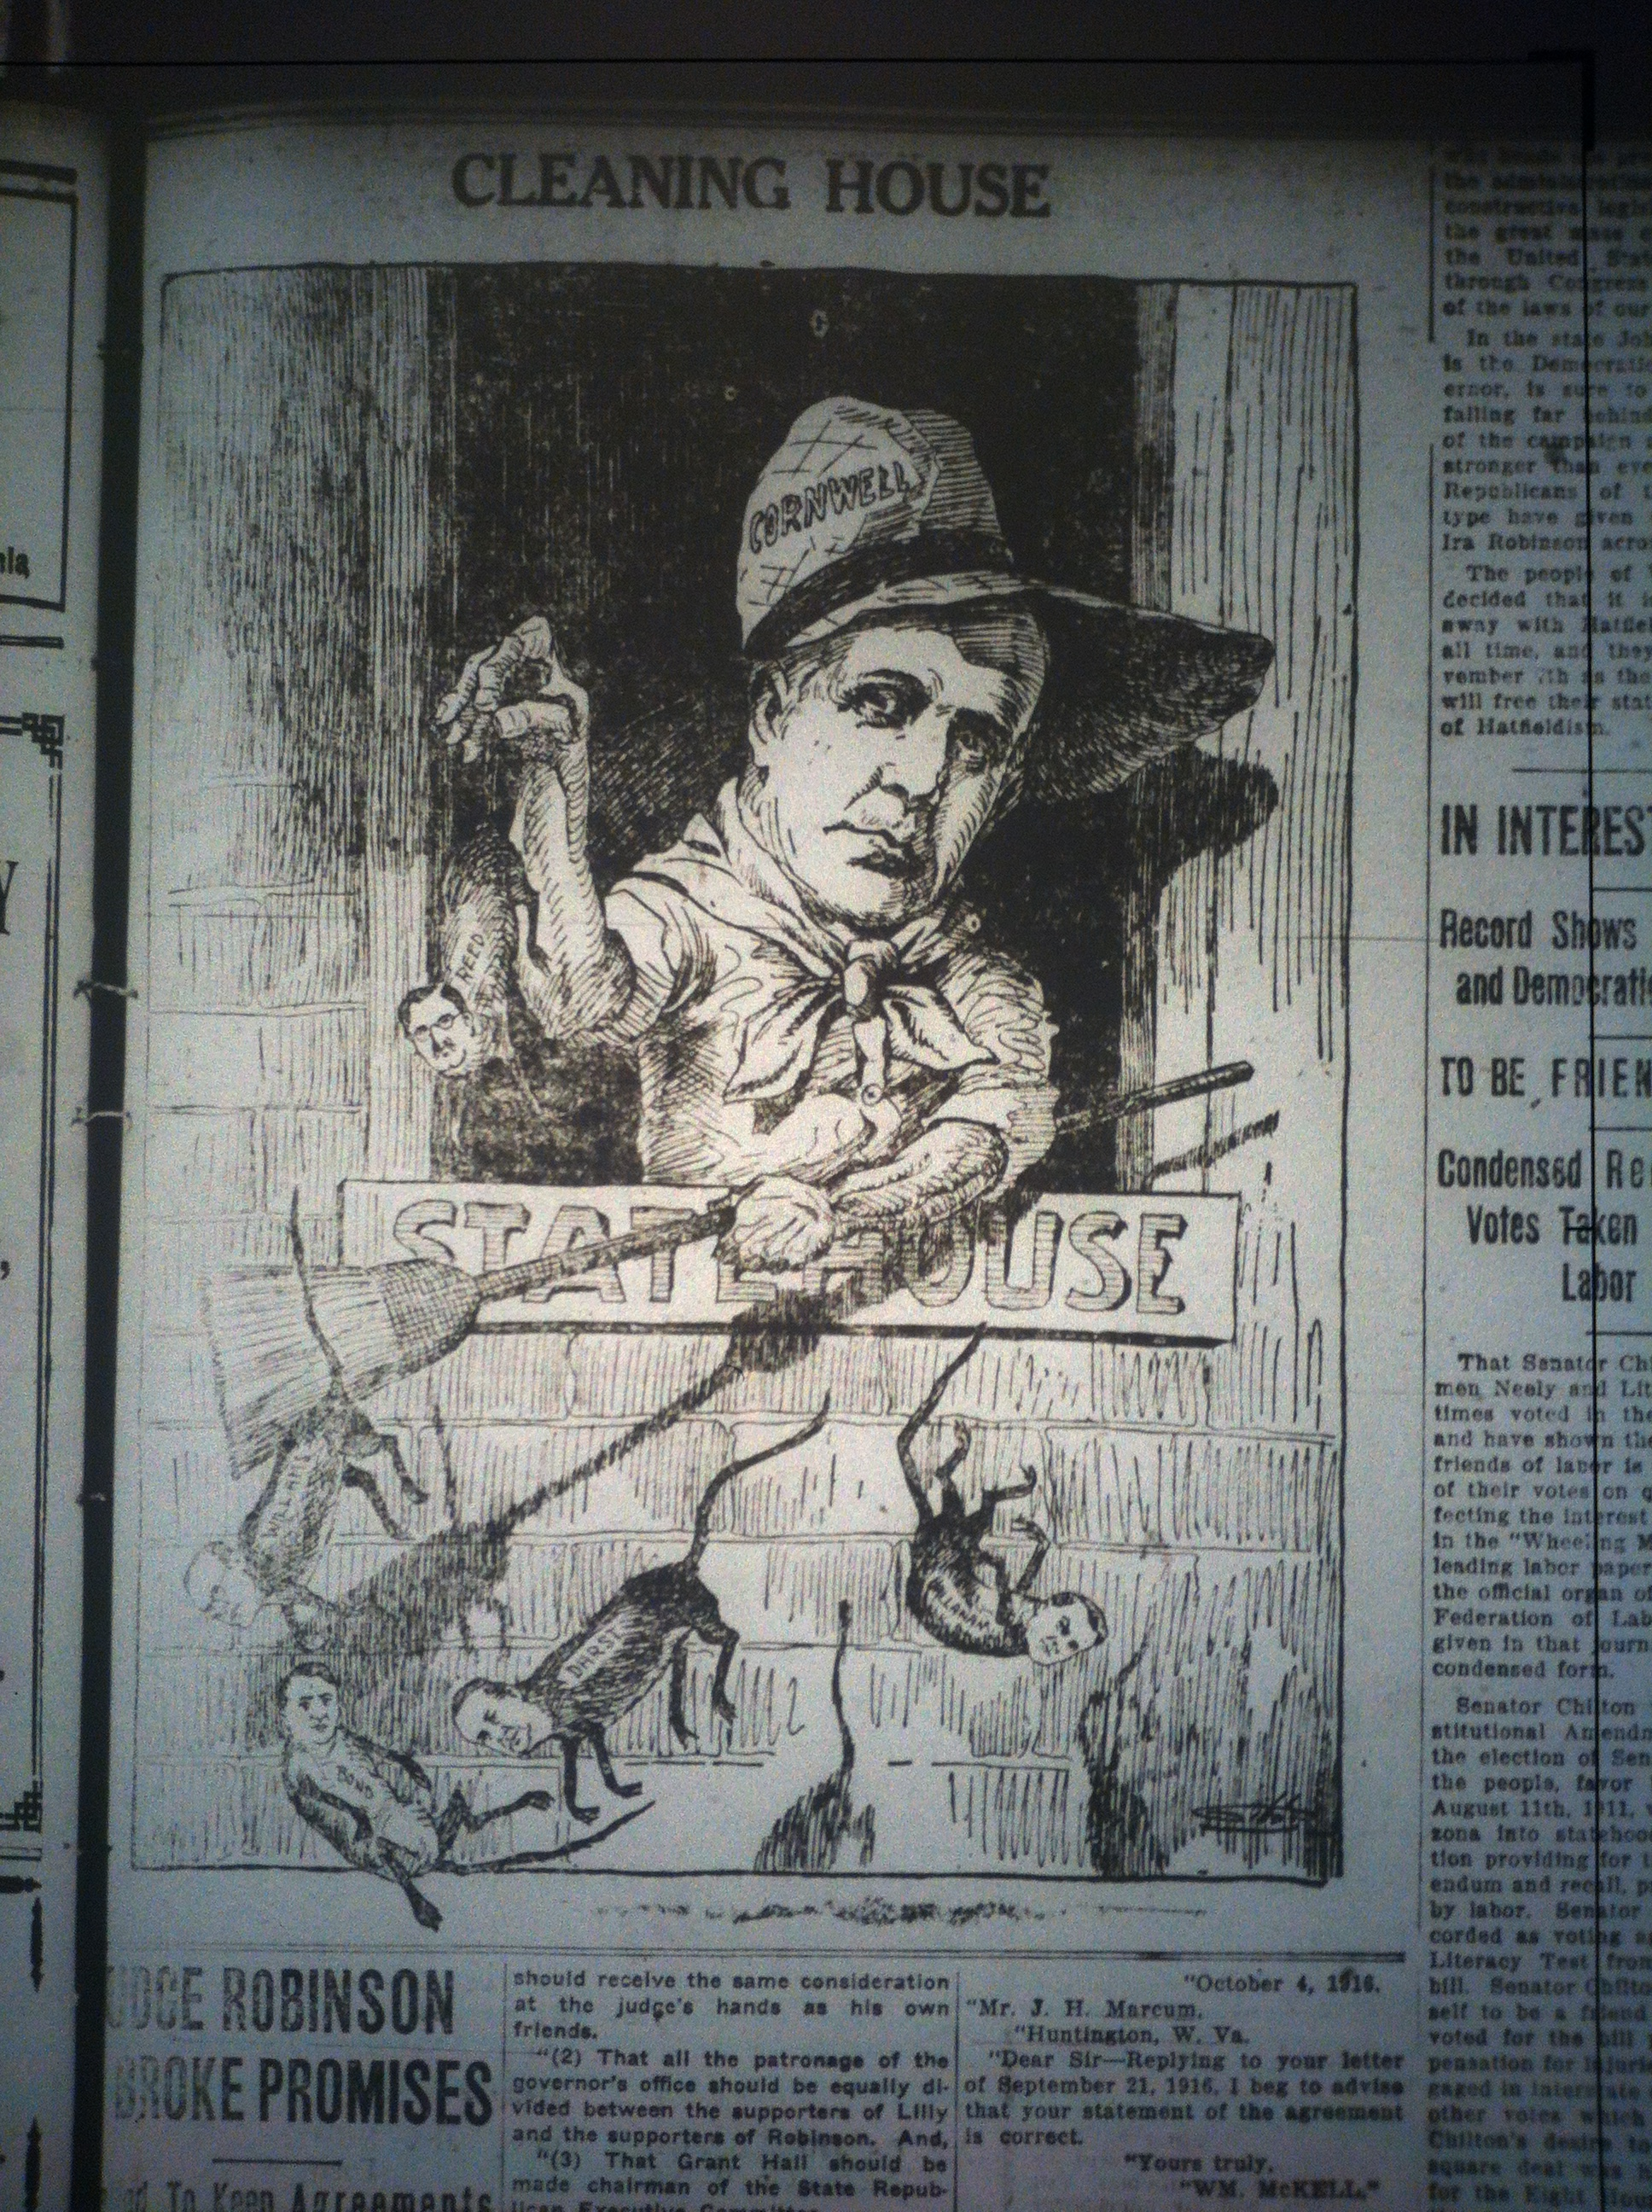 Cornwell Political Cartoon LD 10.26.1916